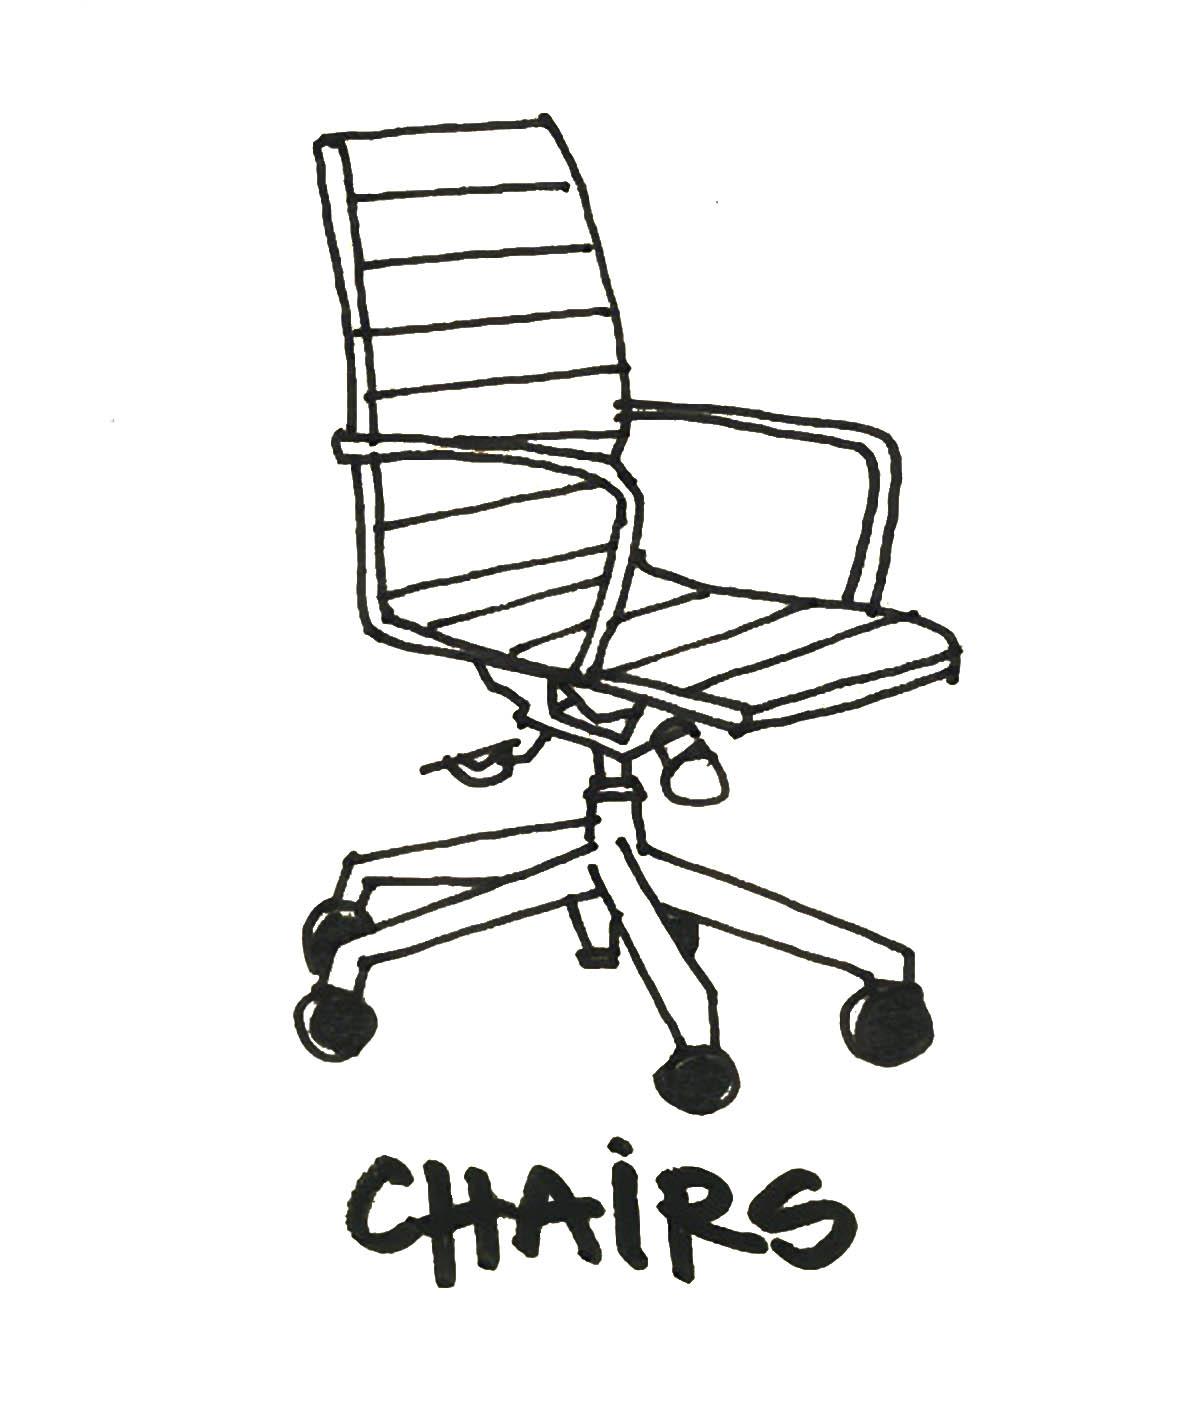 Chairs -website 171212.jpg